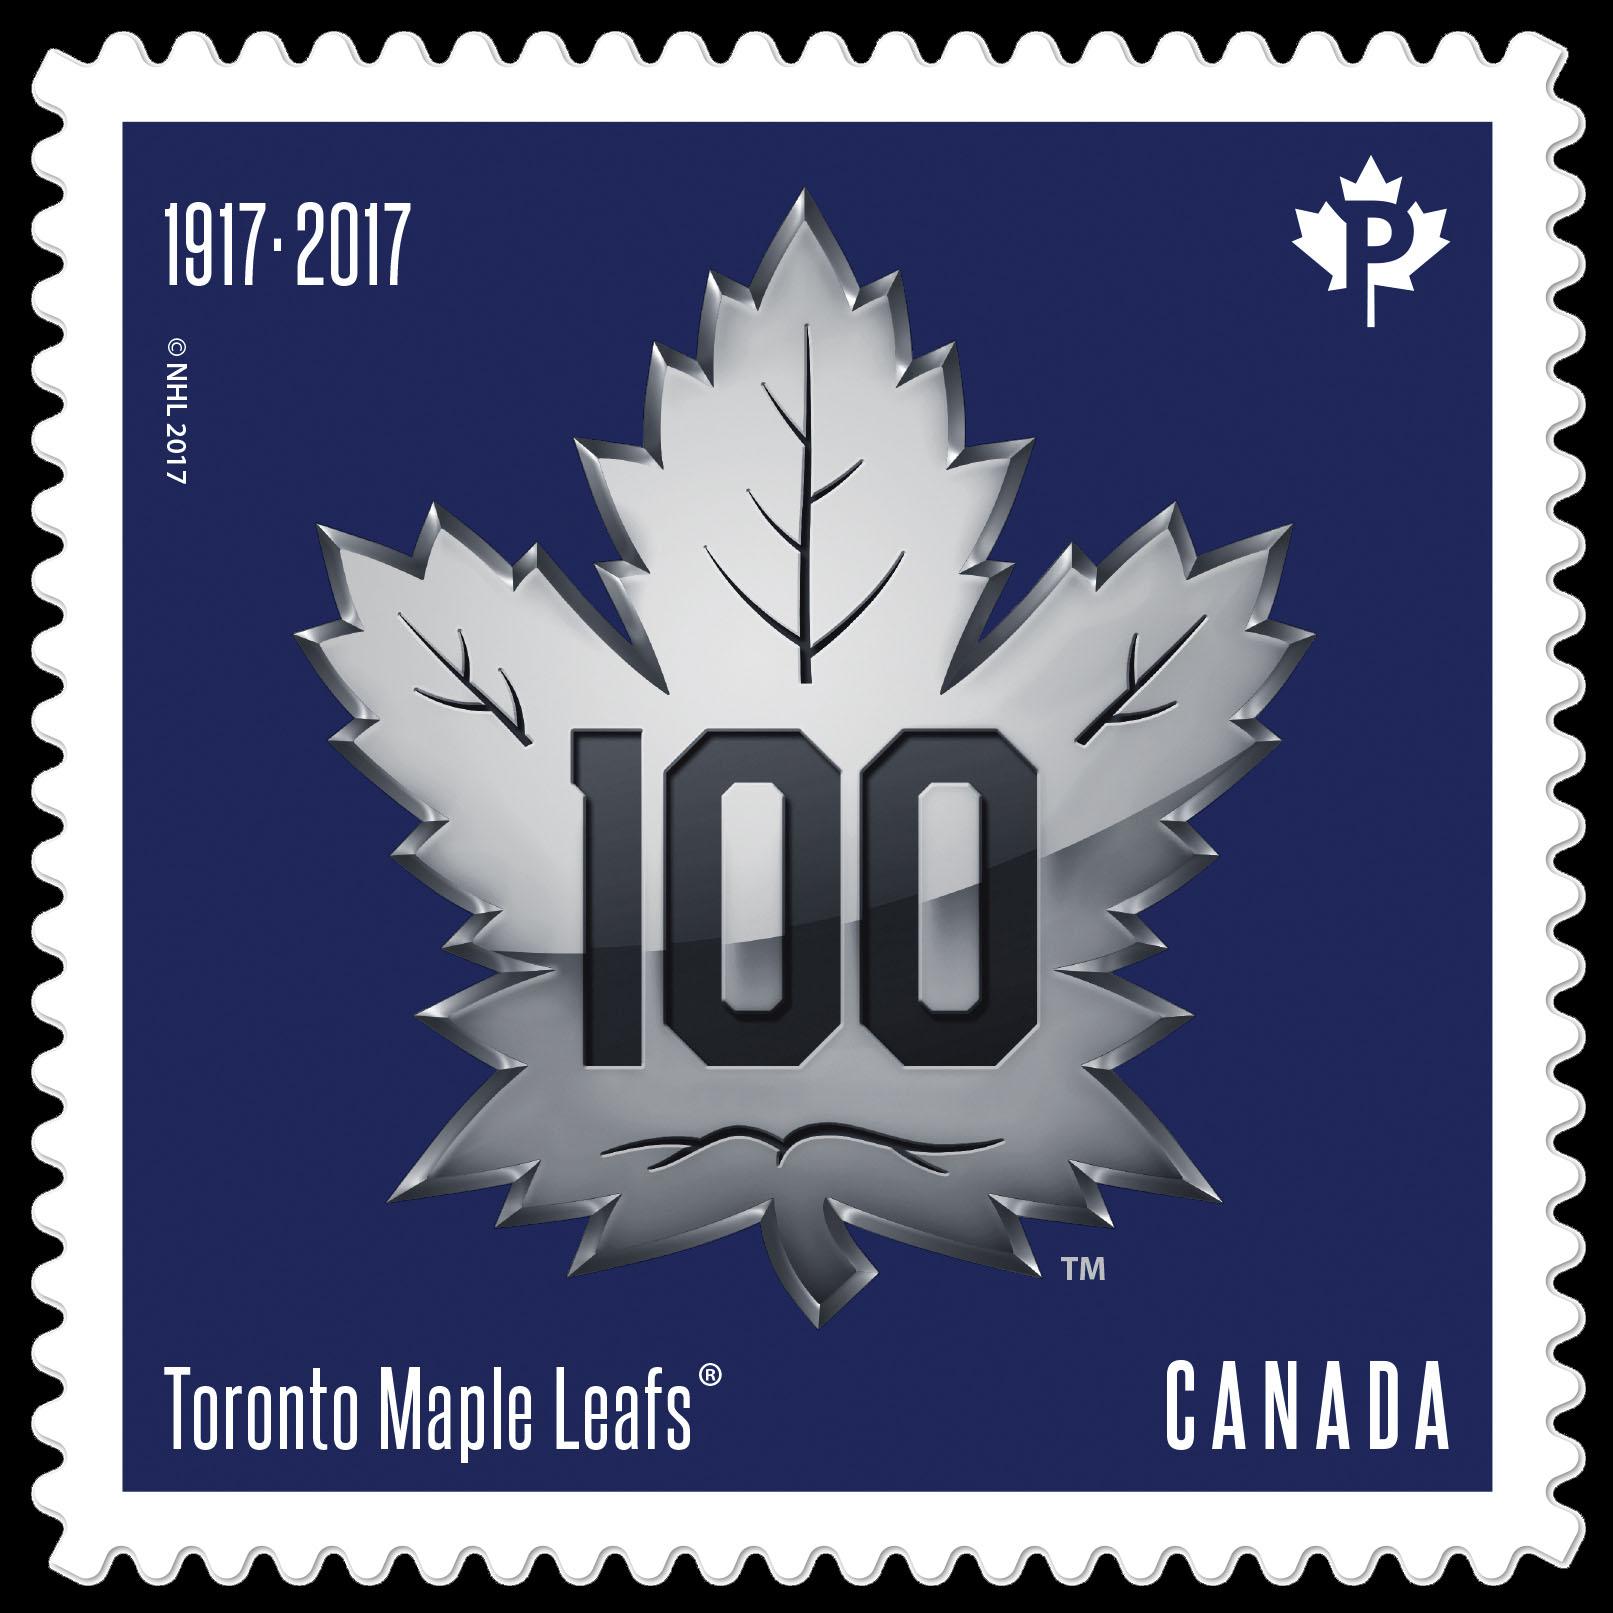 Toronto Maple Leafs 100th Anniversary - Logo Canada Postage Stamp   Toronto Maple Leafs 100th Anniversary